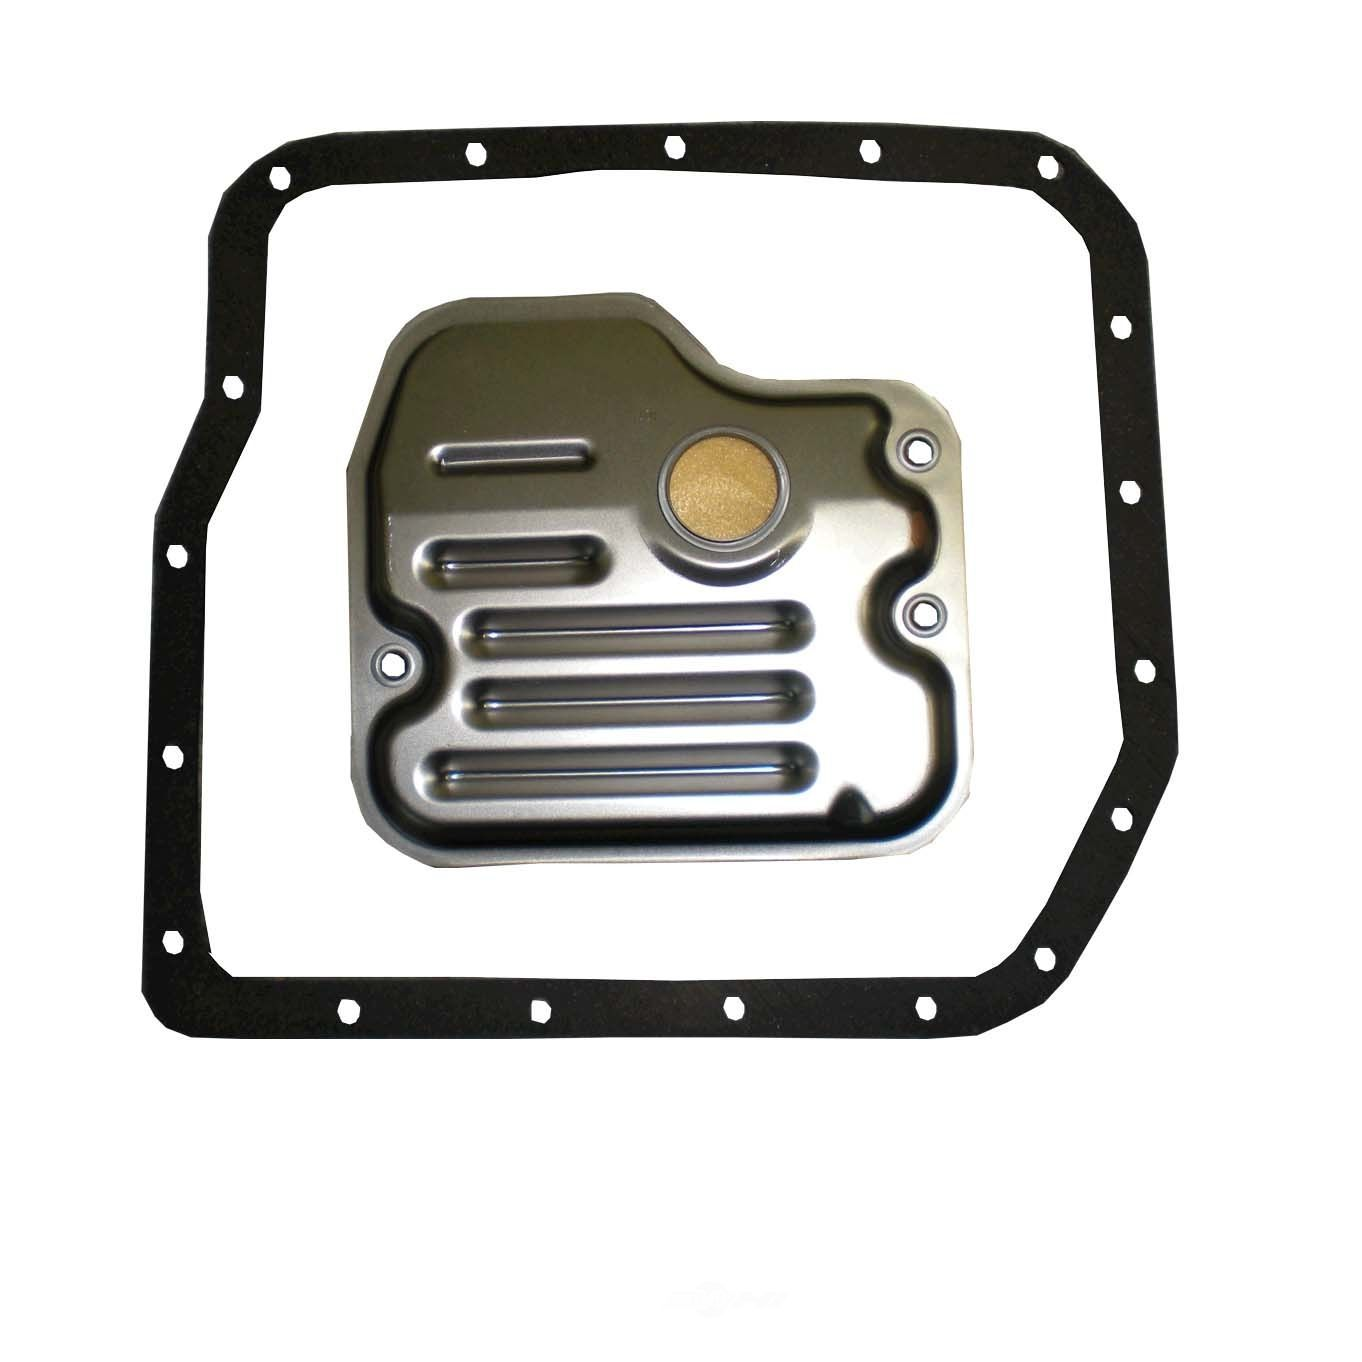 PARTS MASTER/GKI - Auto Trans Filter Kit - P97 88010